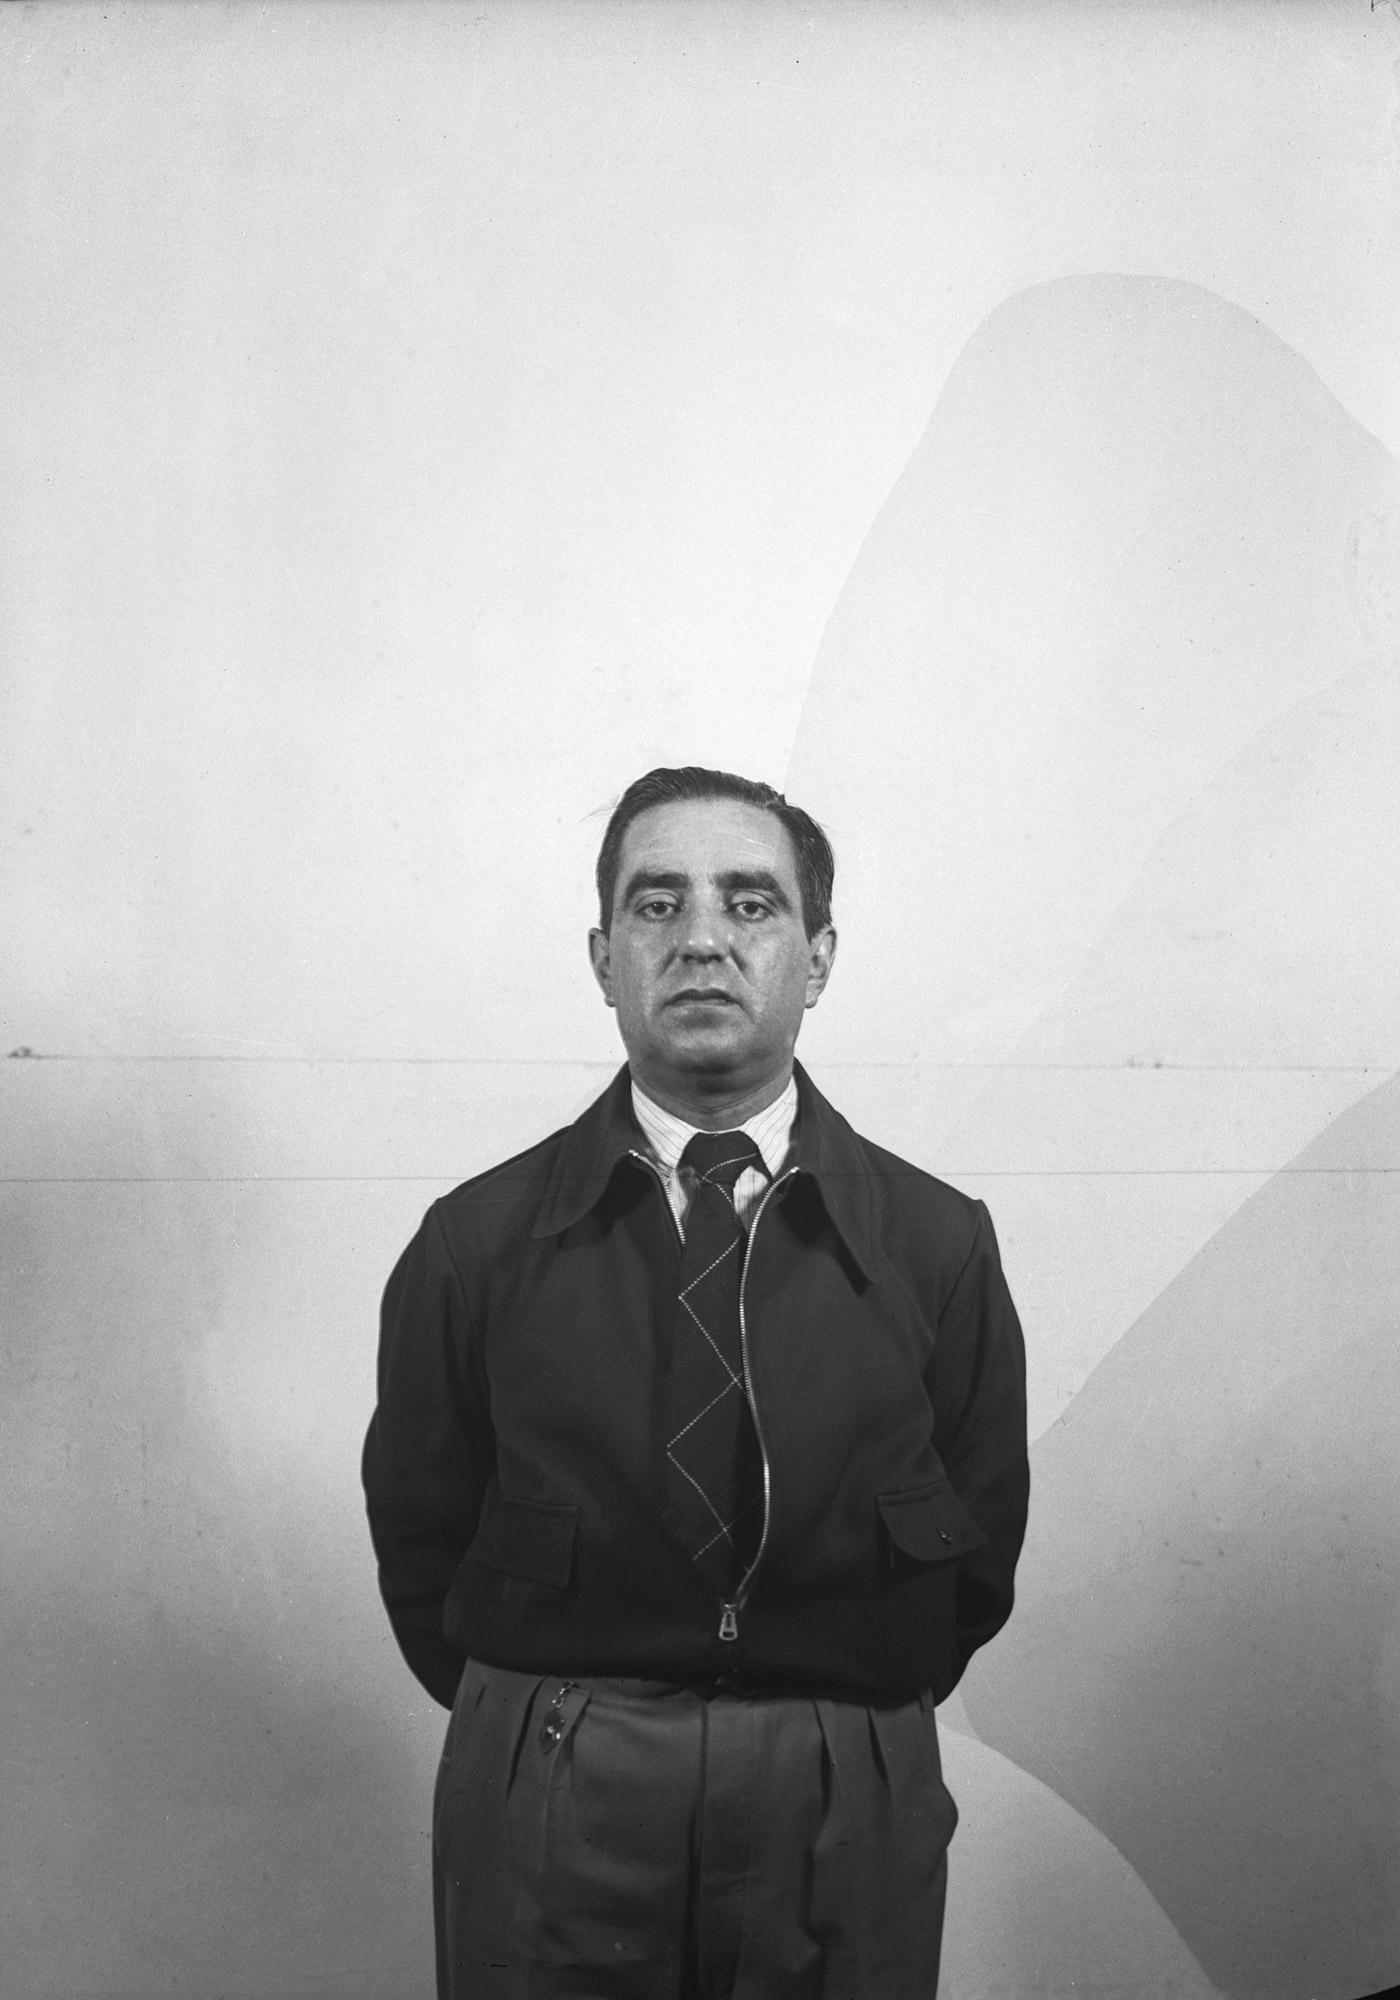 Autorretrato. Antonio Quintana